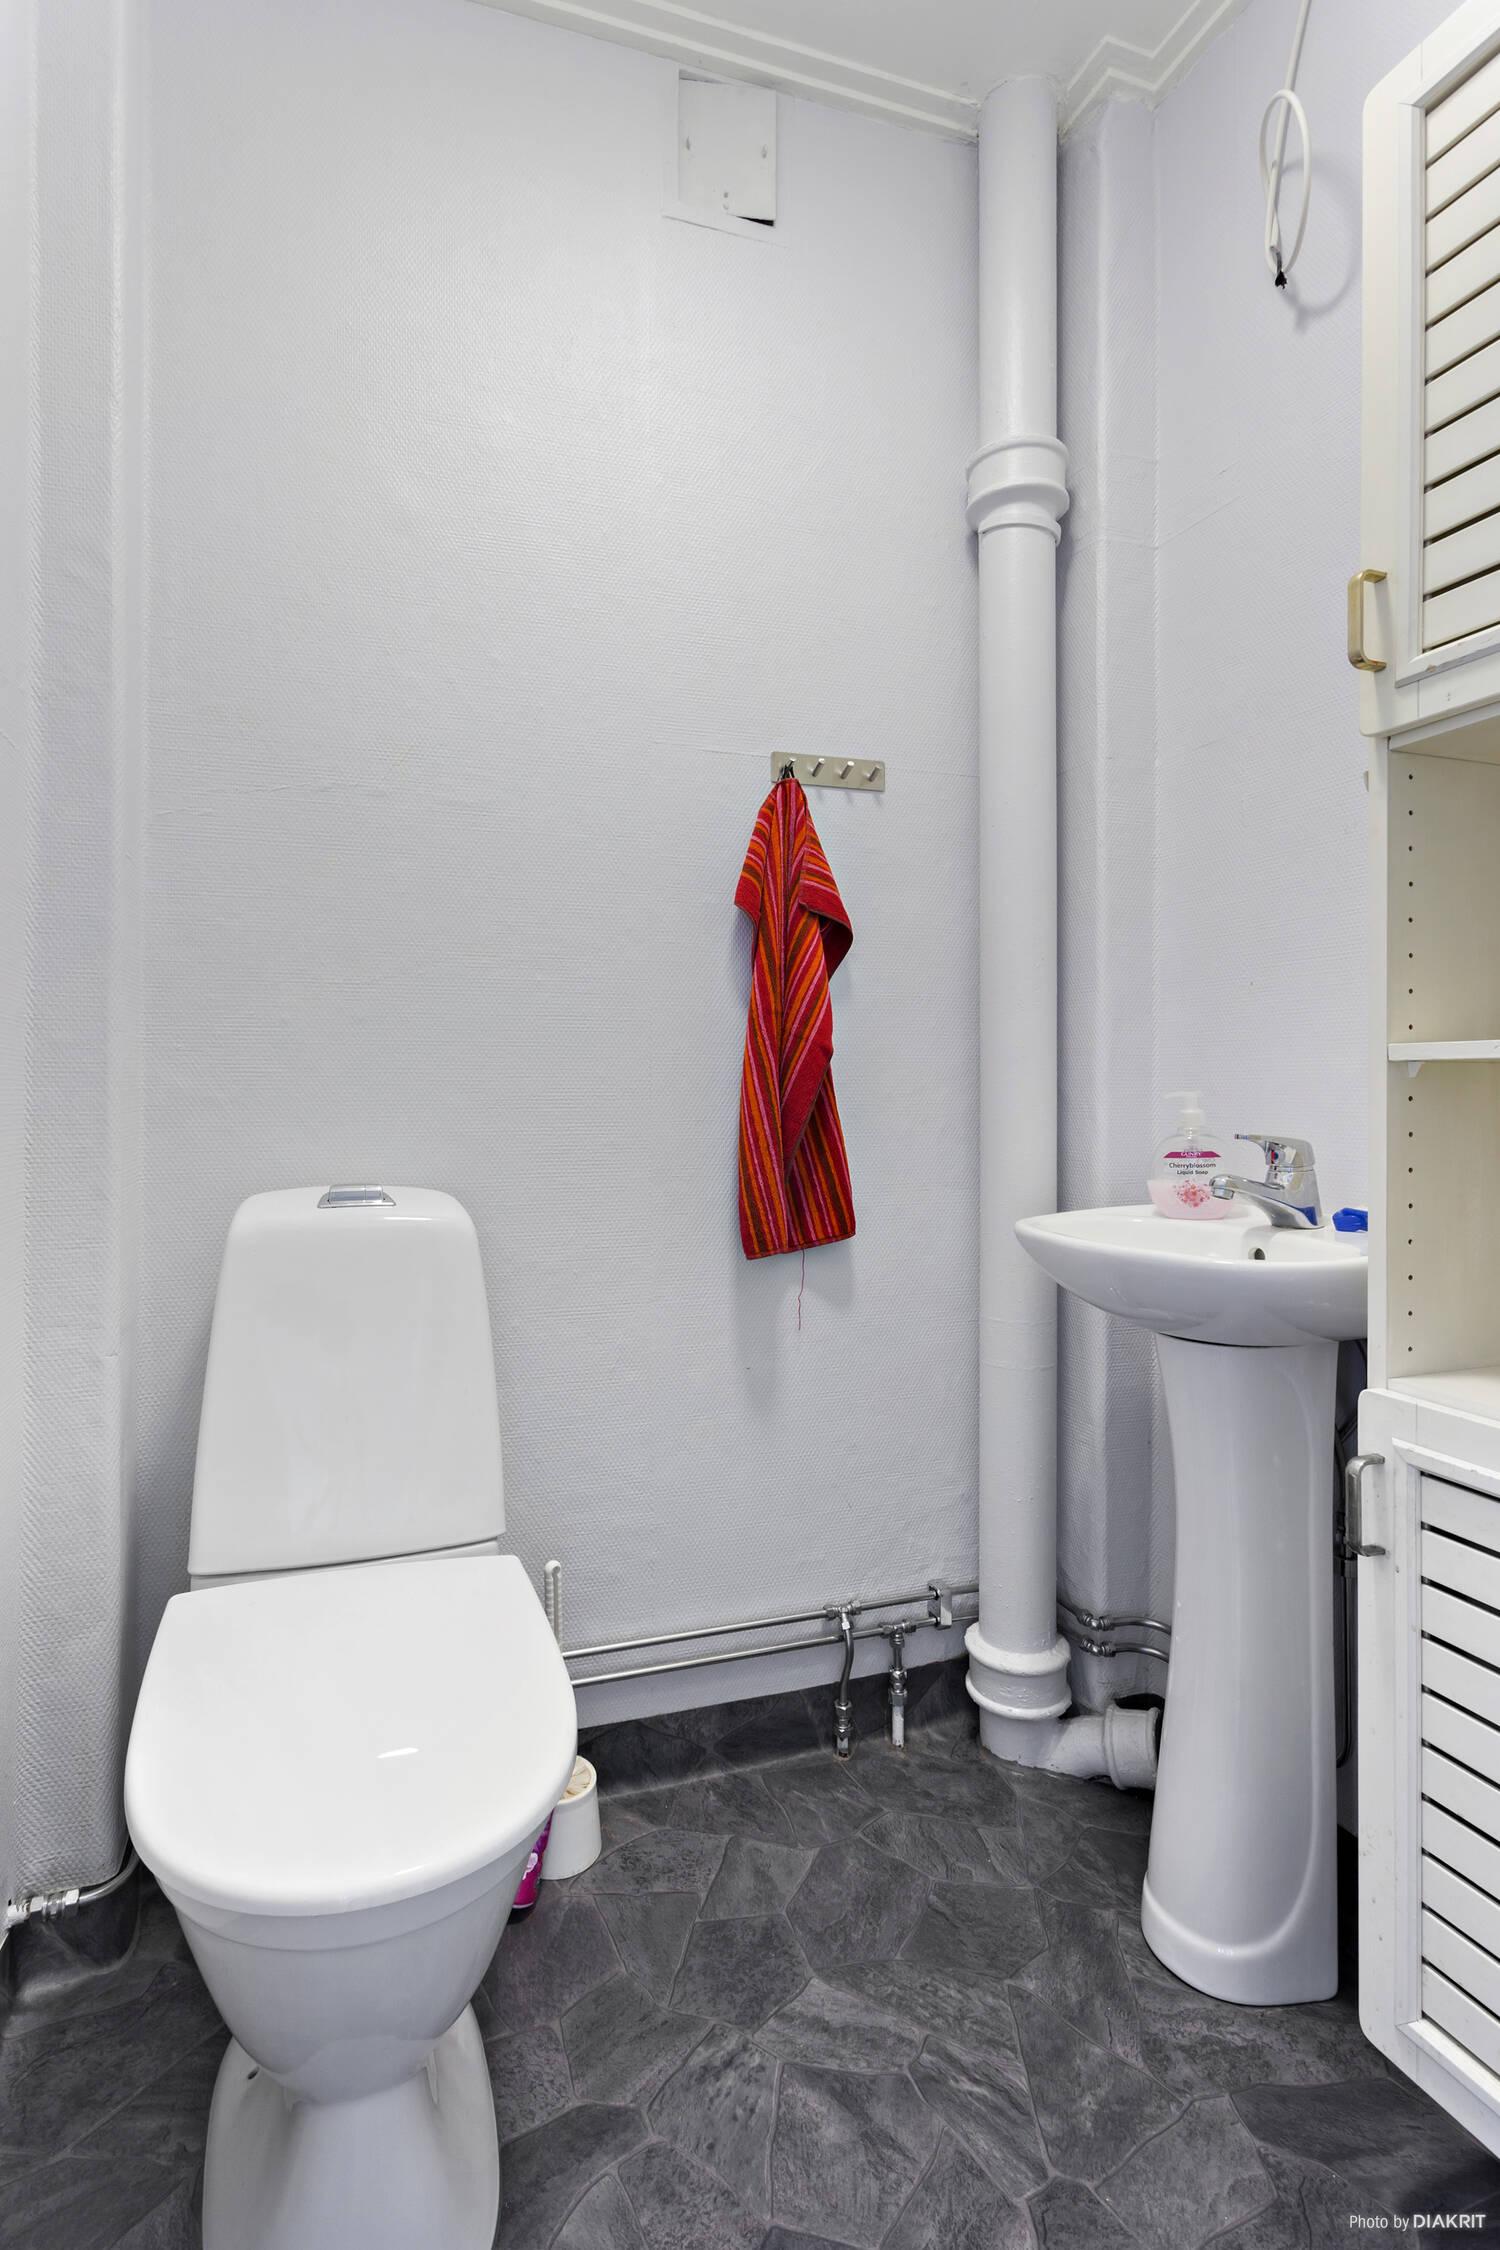 Toalett(Vindsplan)